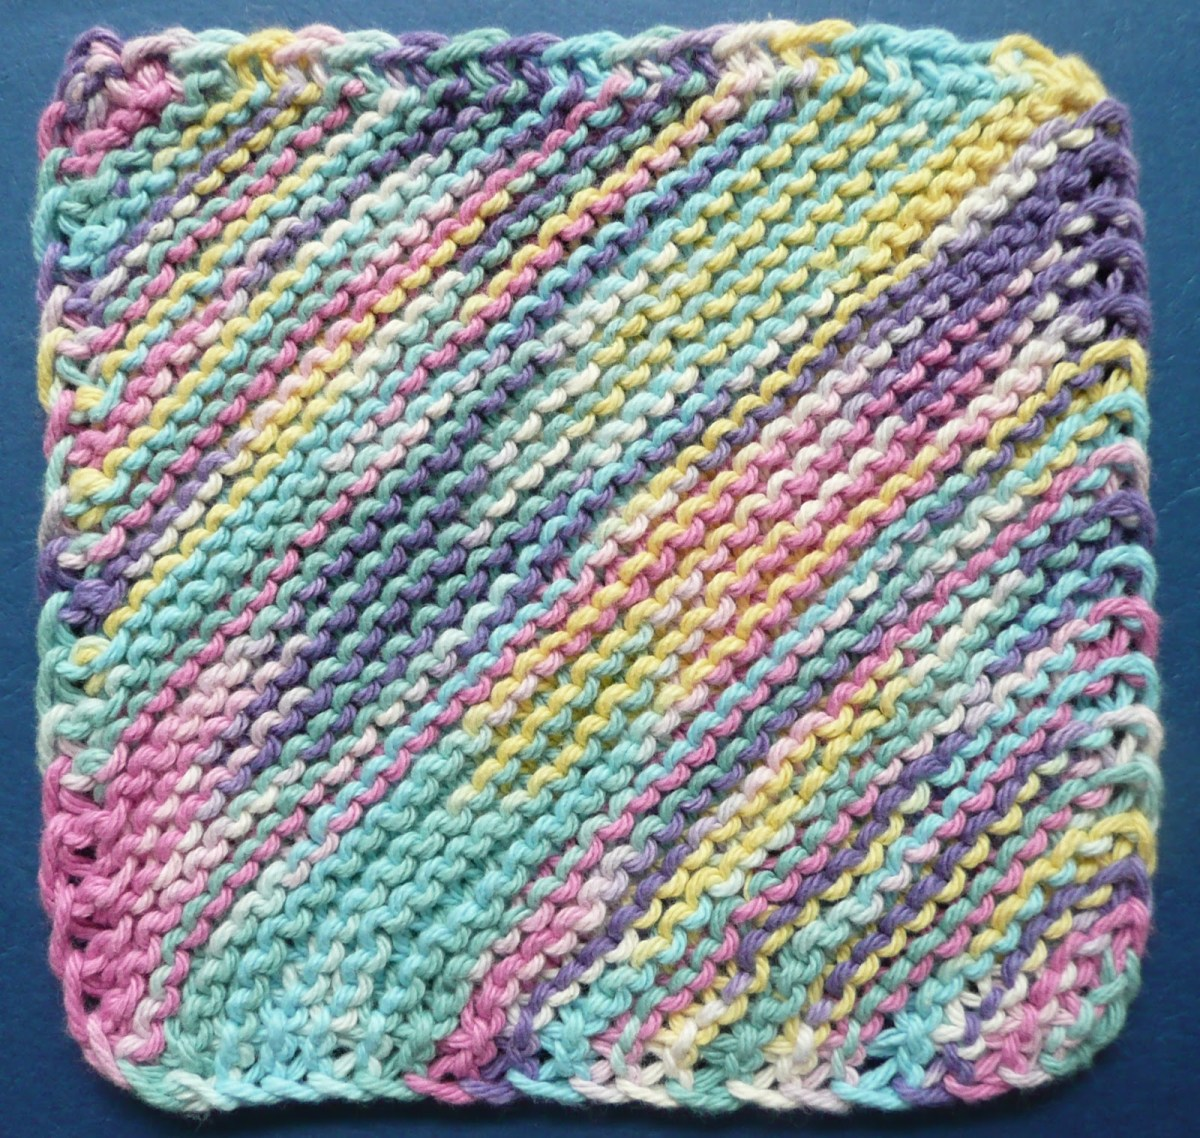 Quick and Simple Dish Cloth Crochet Pattern Sugar N Cream Crochet Dishcloth Pattern Mincifinefr